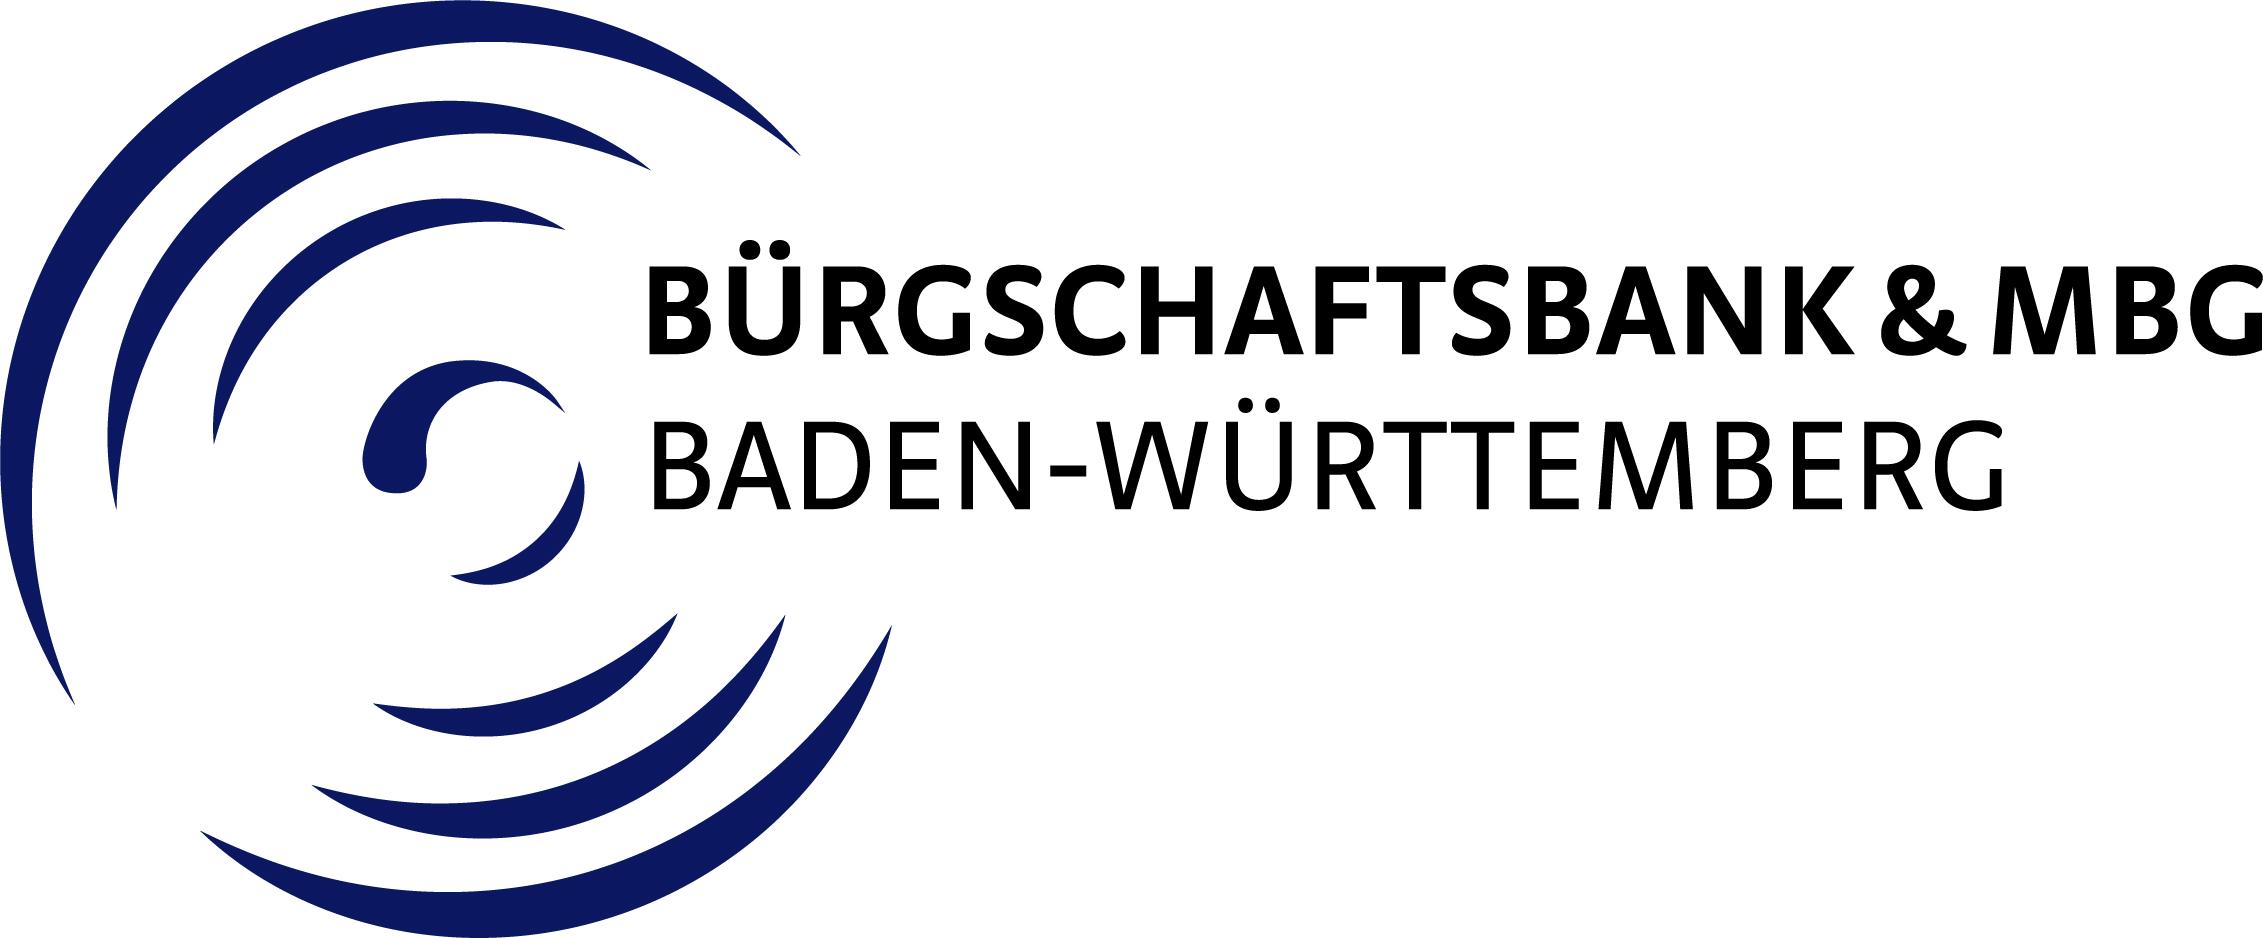 logo_bb-mbg_gemeinsam